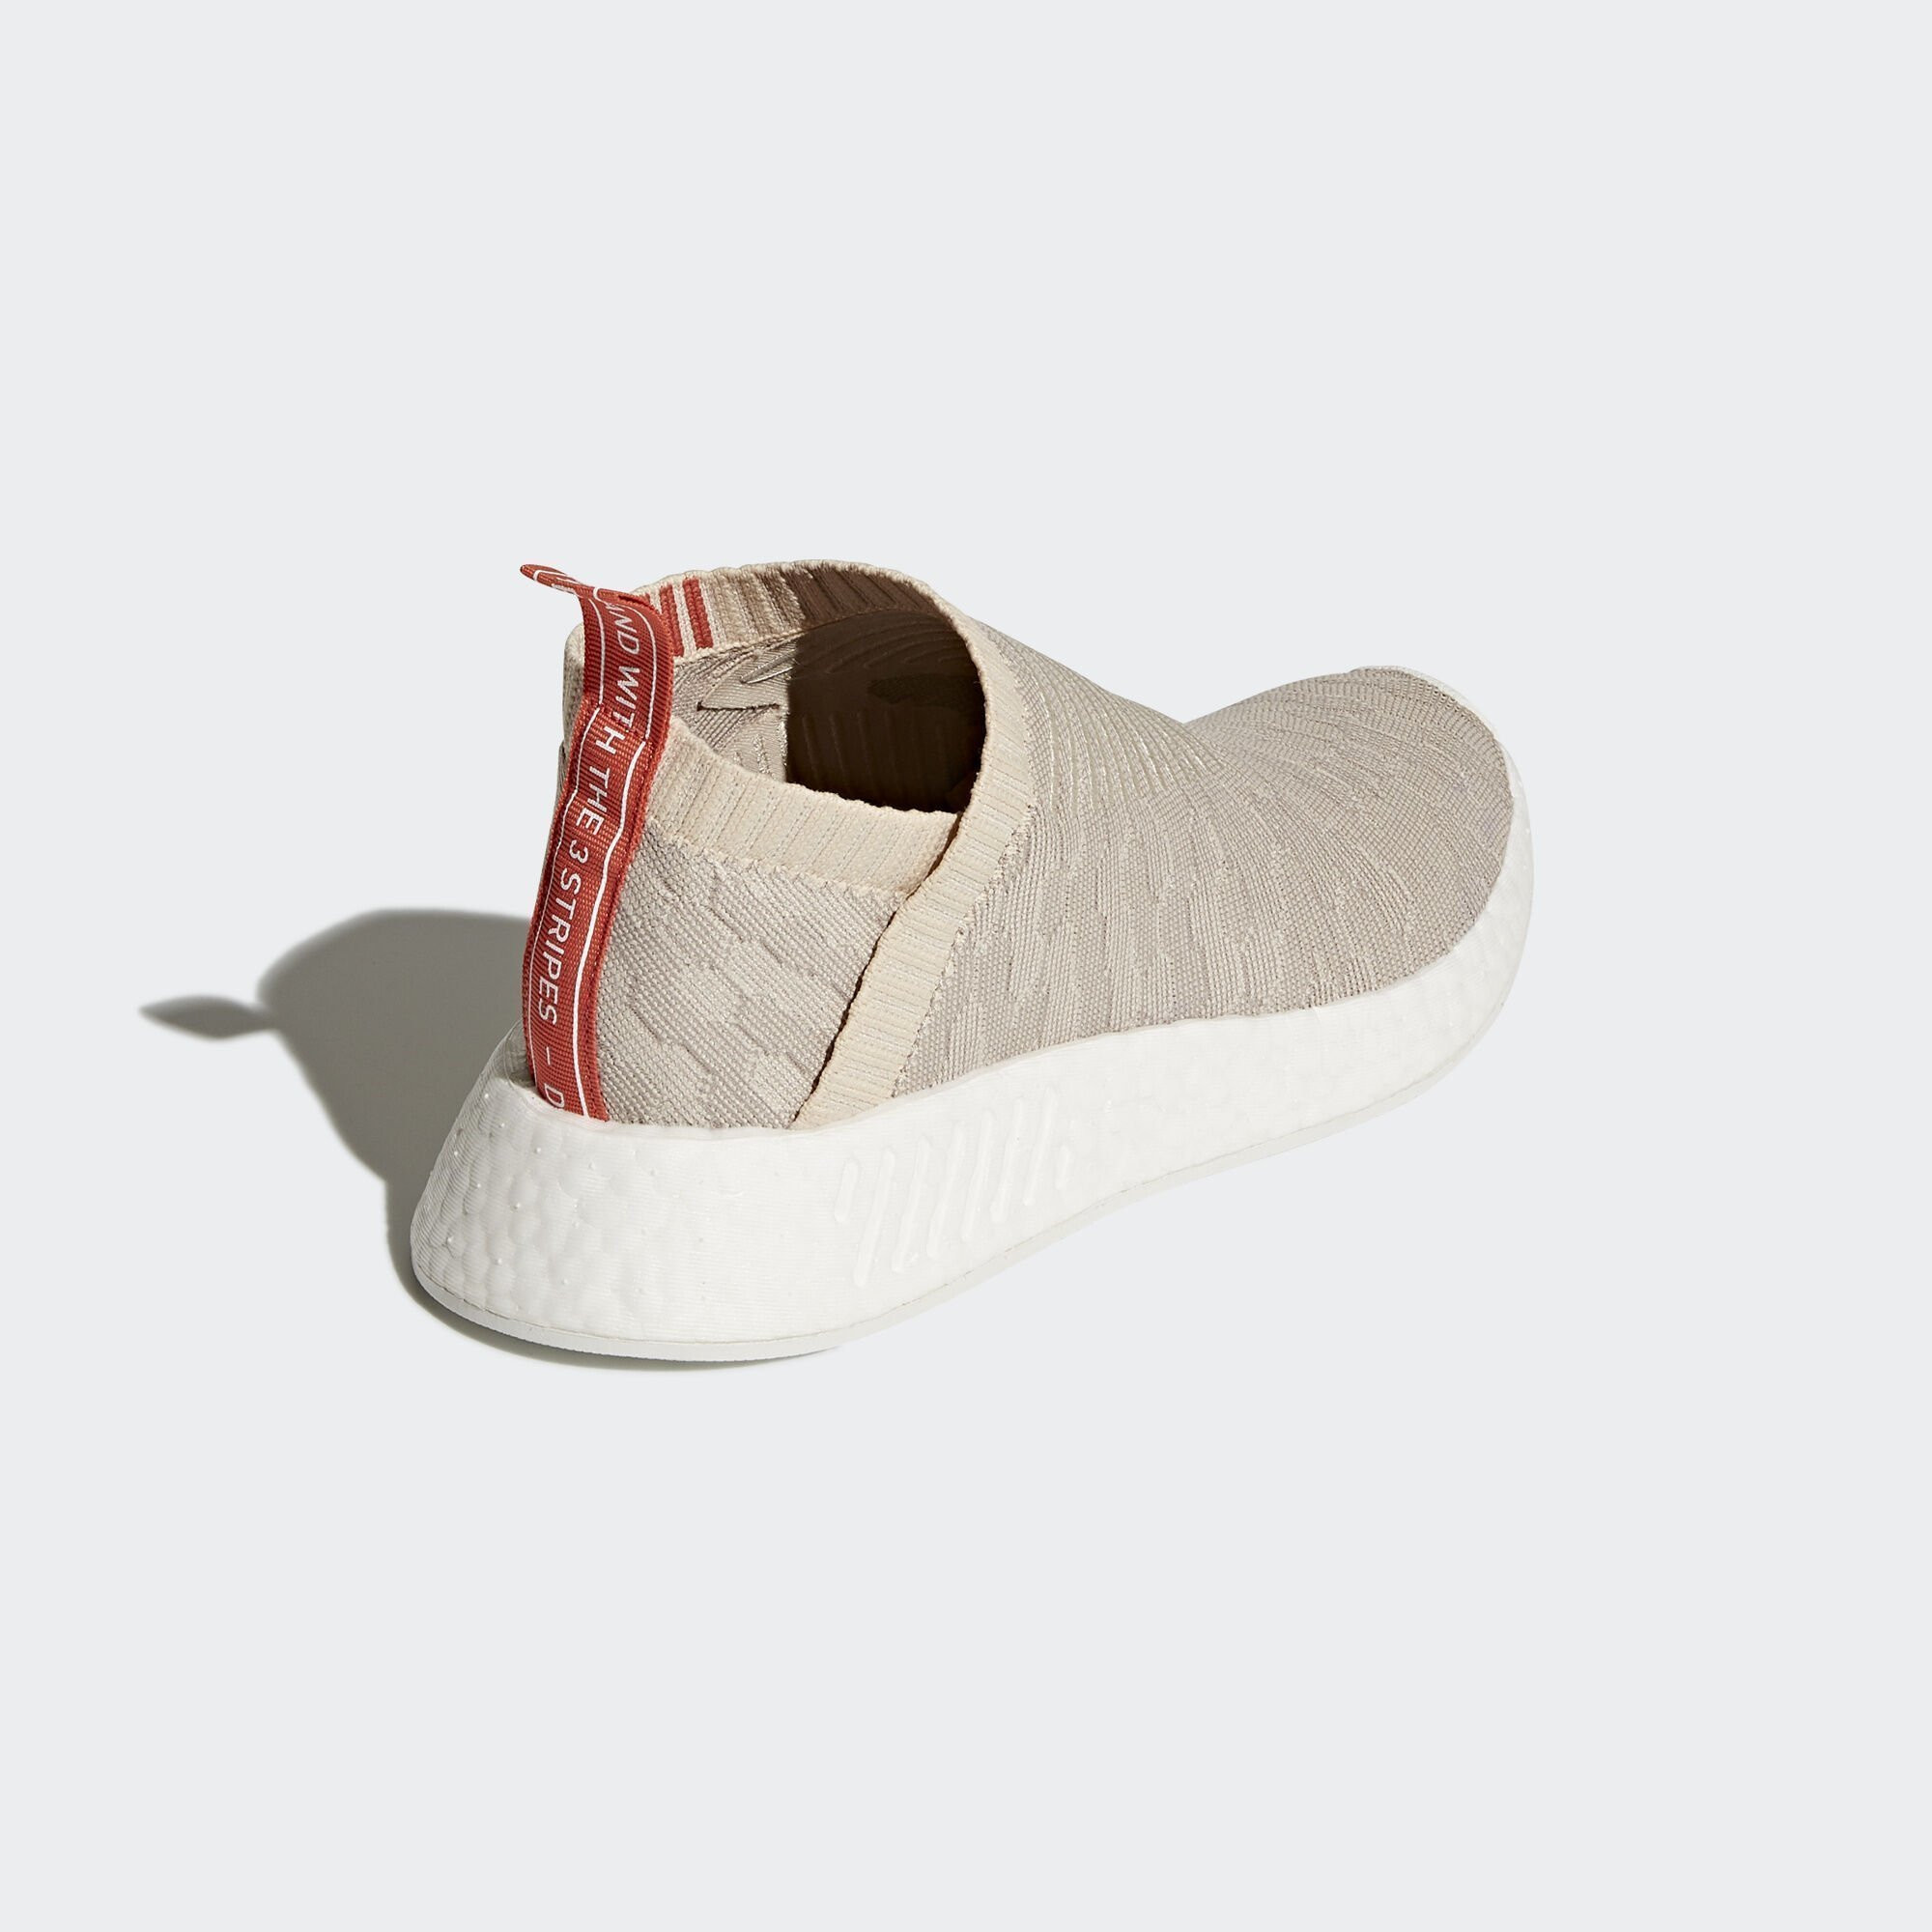 adidas NMD CS2 Linen Vapor Grey (W) (CQ2039)